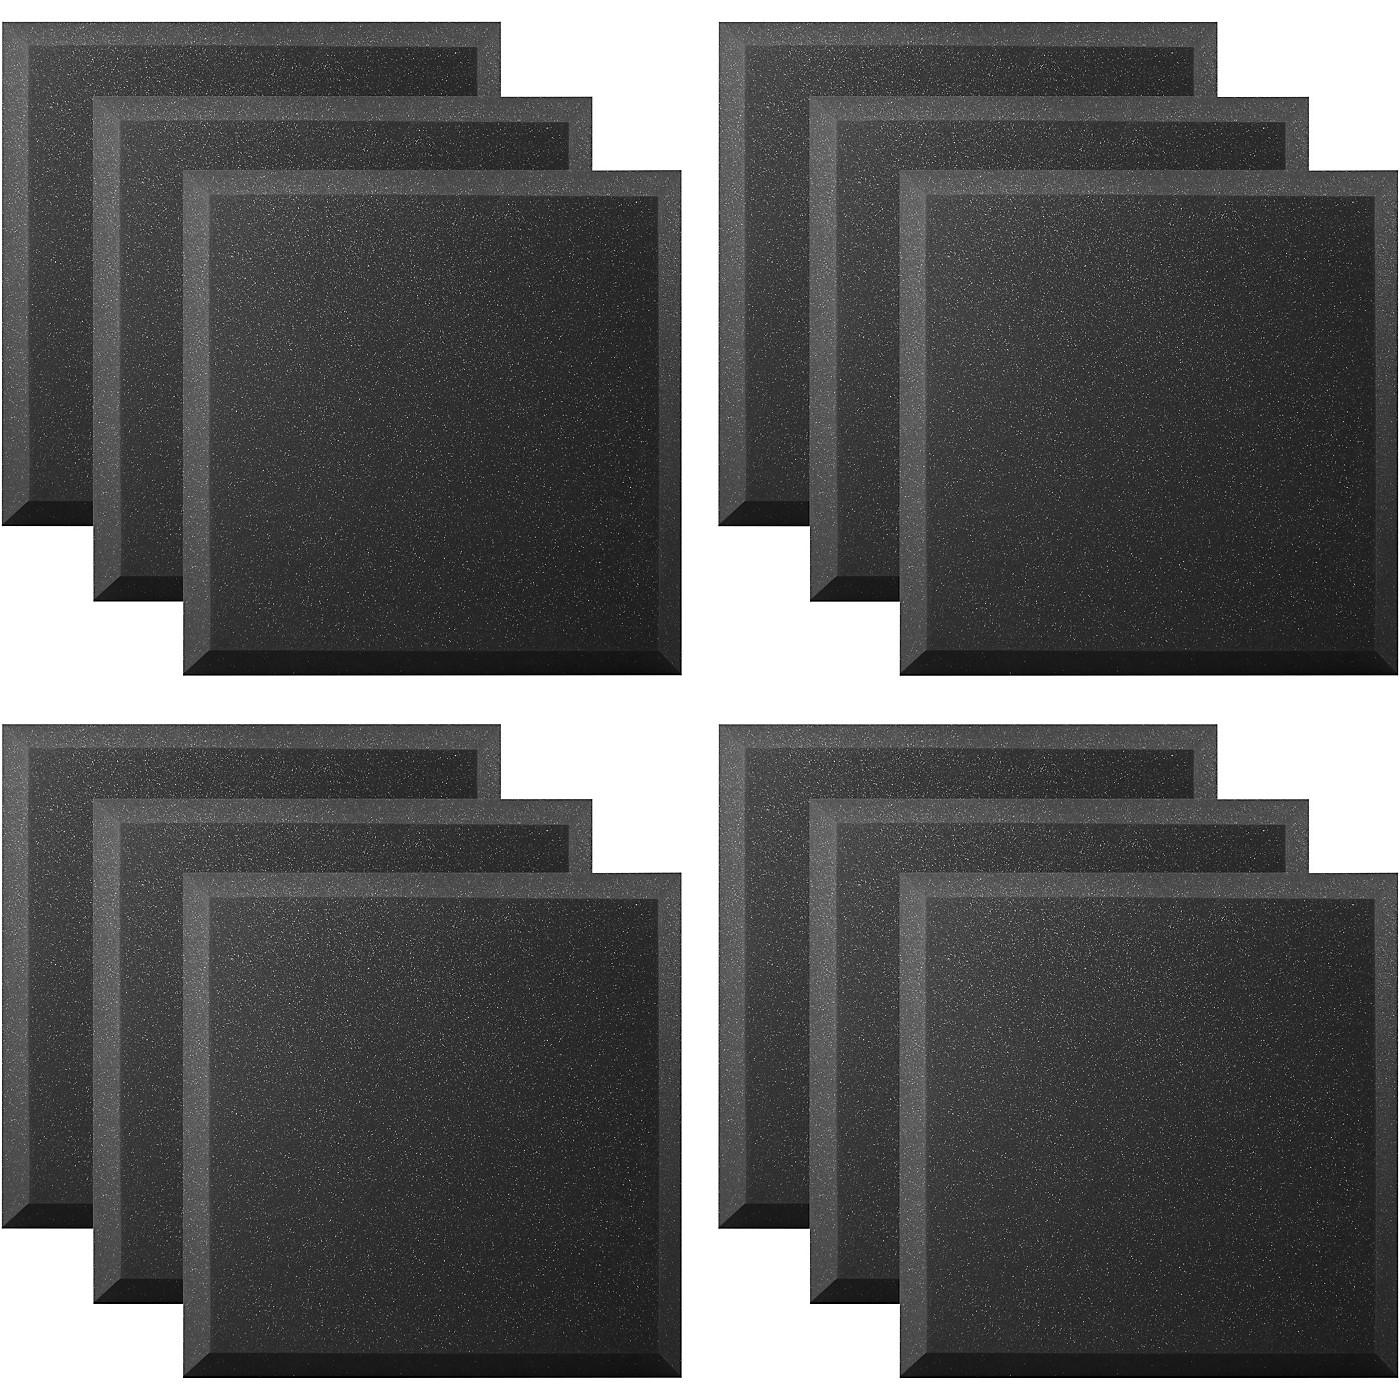 Ultimate Acoustics Acoustic Panel - 24x24x2 Bevel (12 Pack) thumbnail